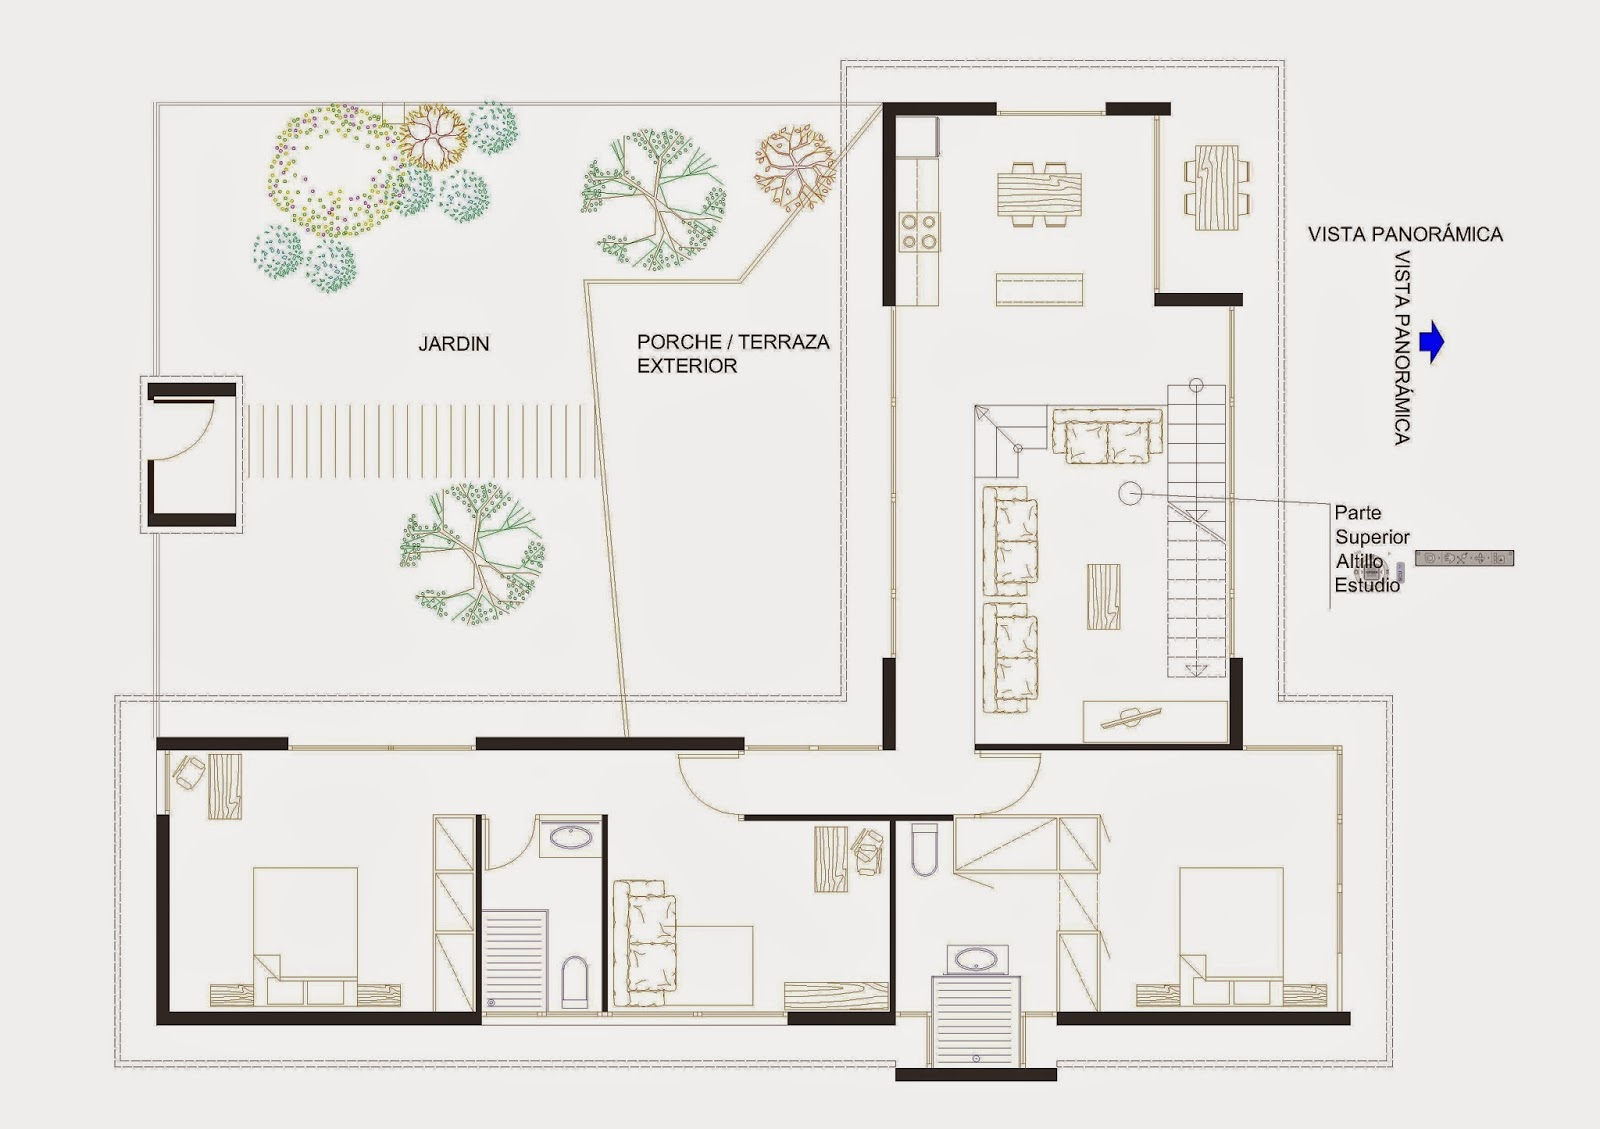 Javier catal n arquitectura dise o funcional de casa de for Disenos de casas 120 m2